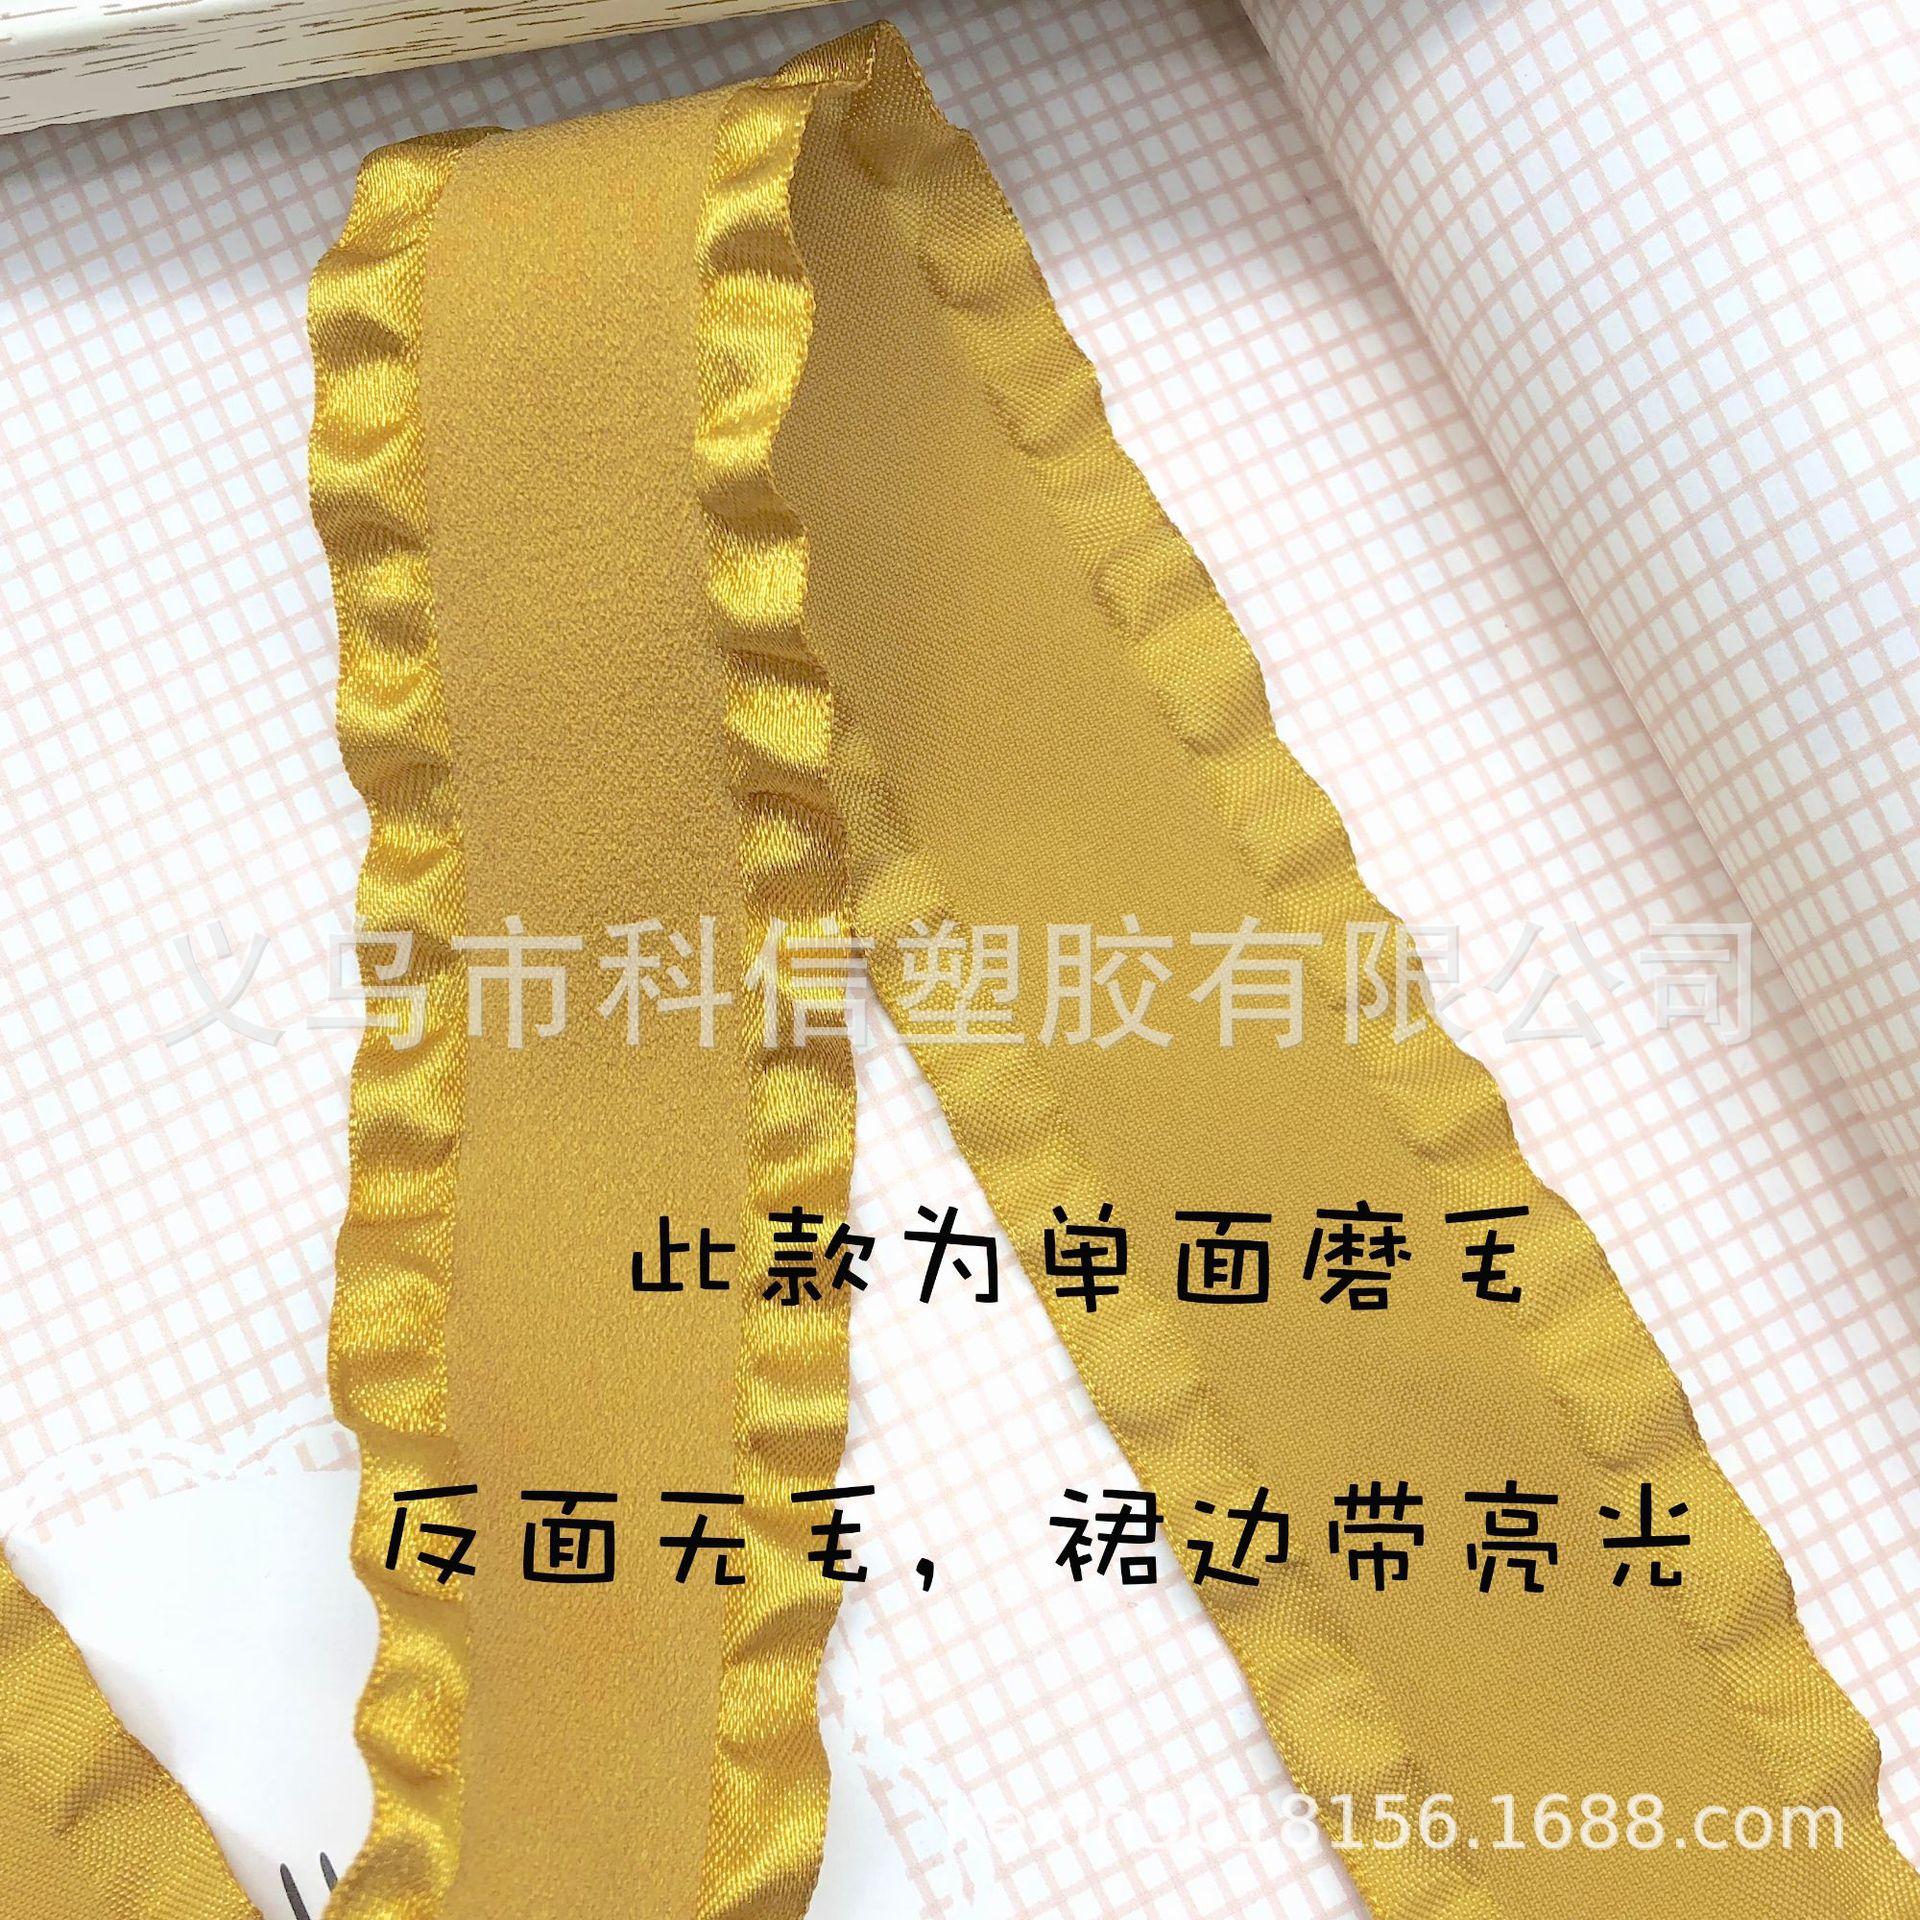 771561625448_.pic_hd.jpg